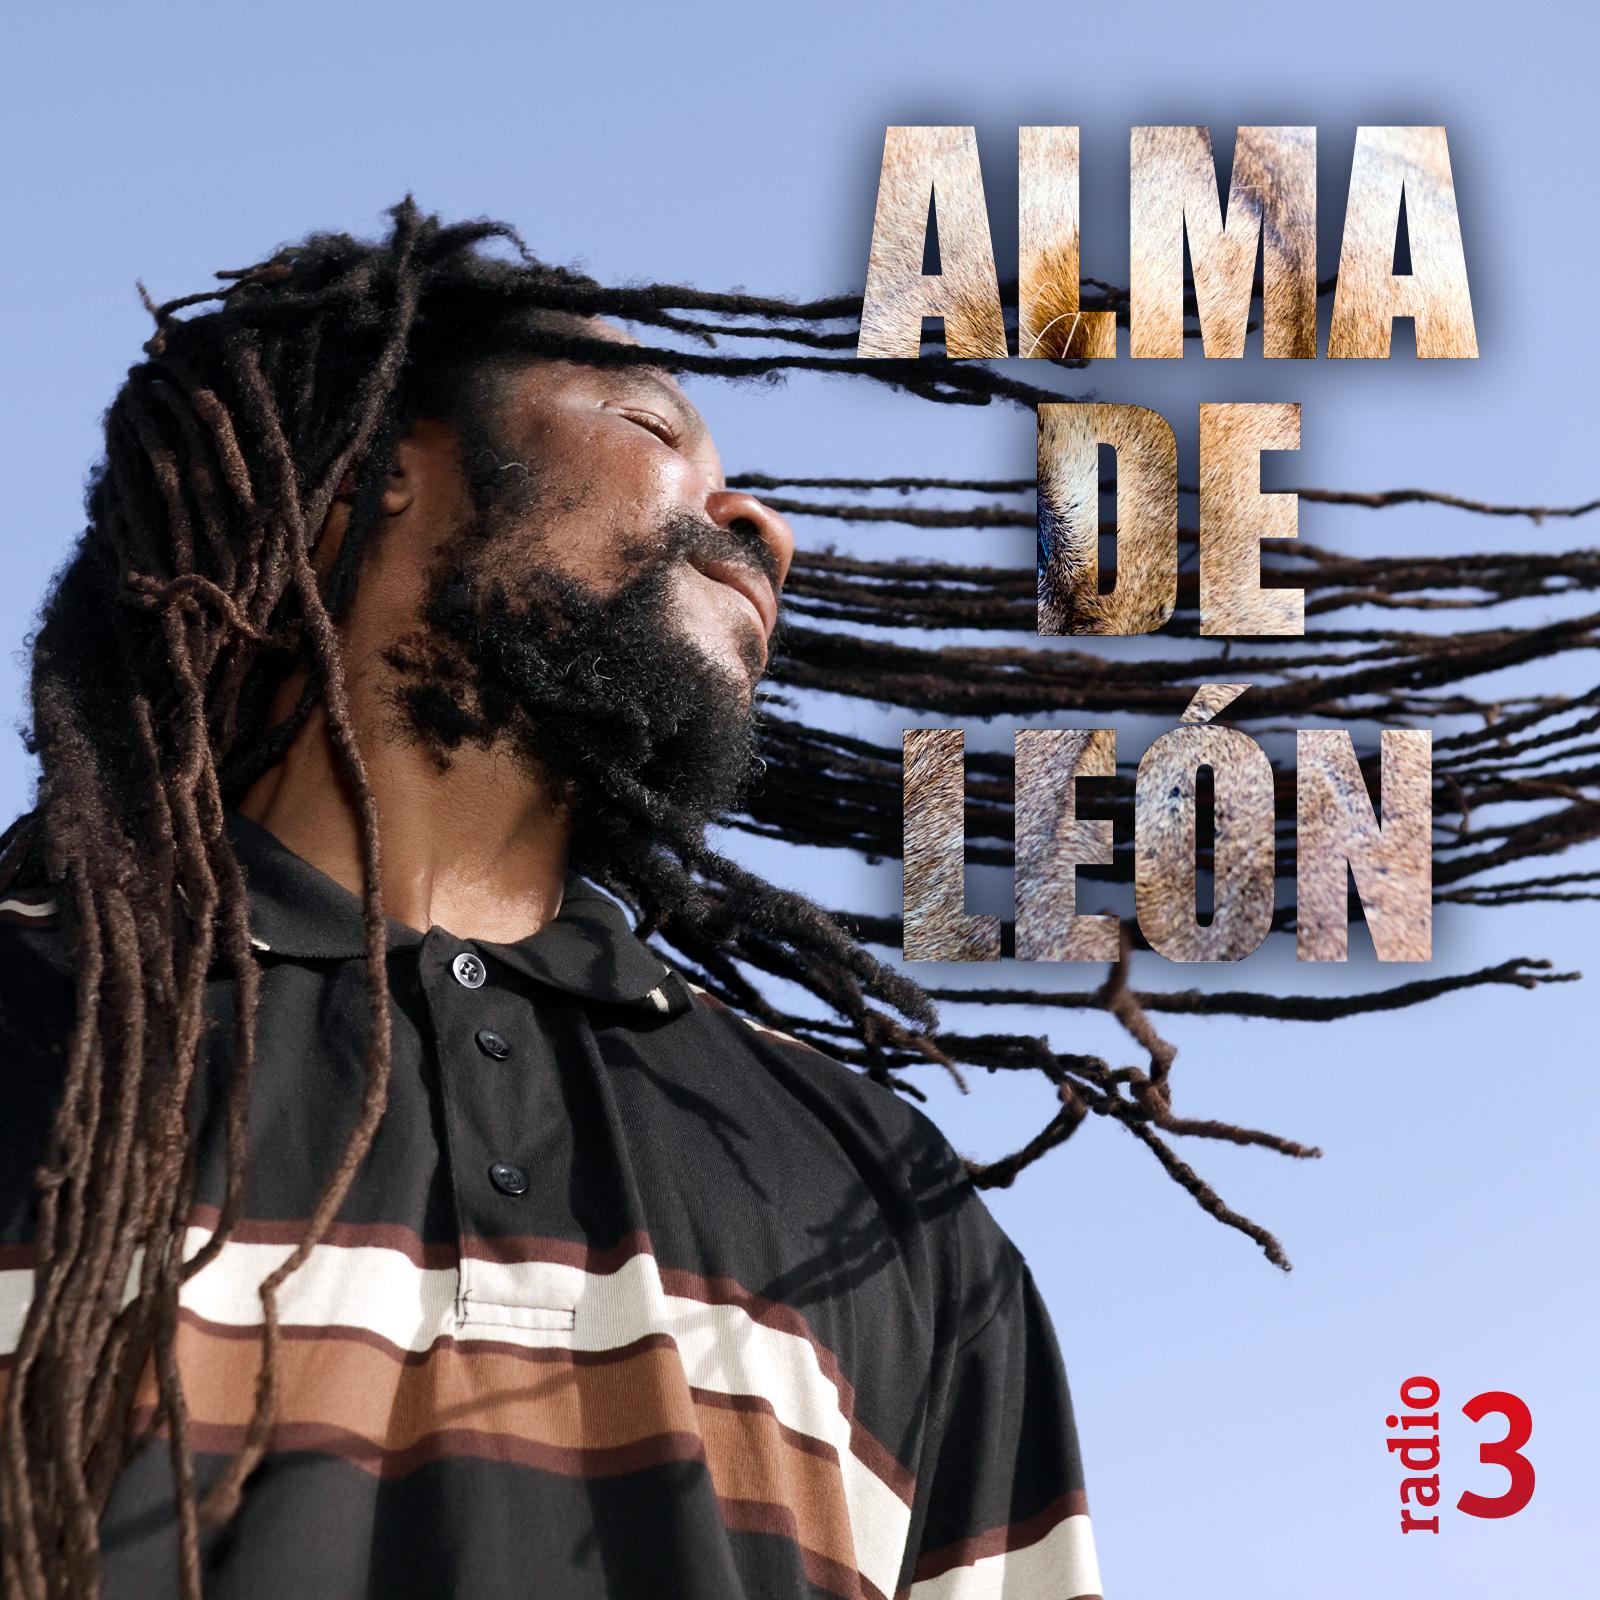 Alma de león - Genís Trani vs La Cobra: dos creadores frente a frente - 17/02/12